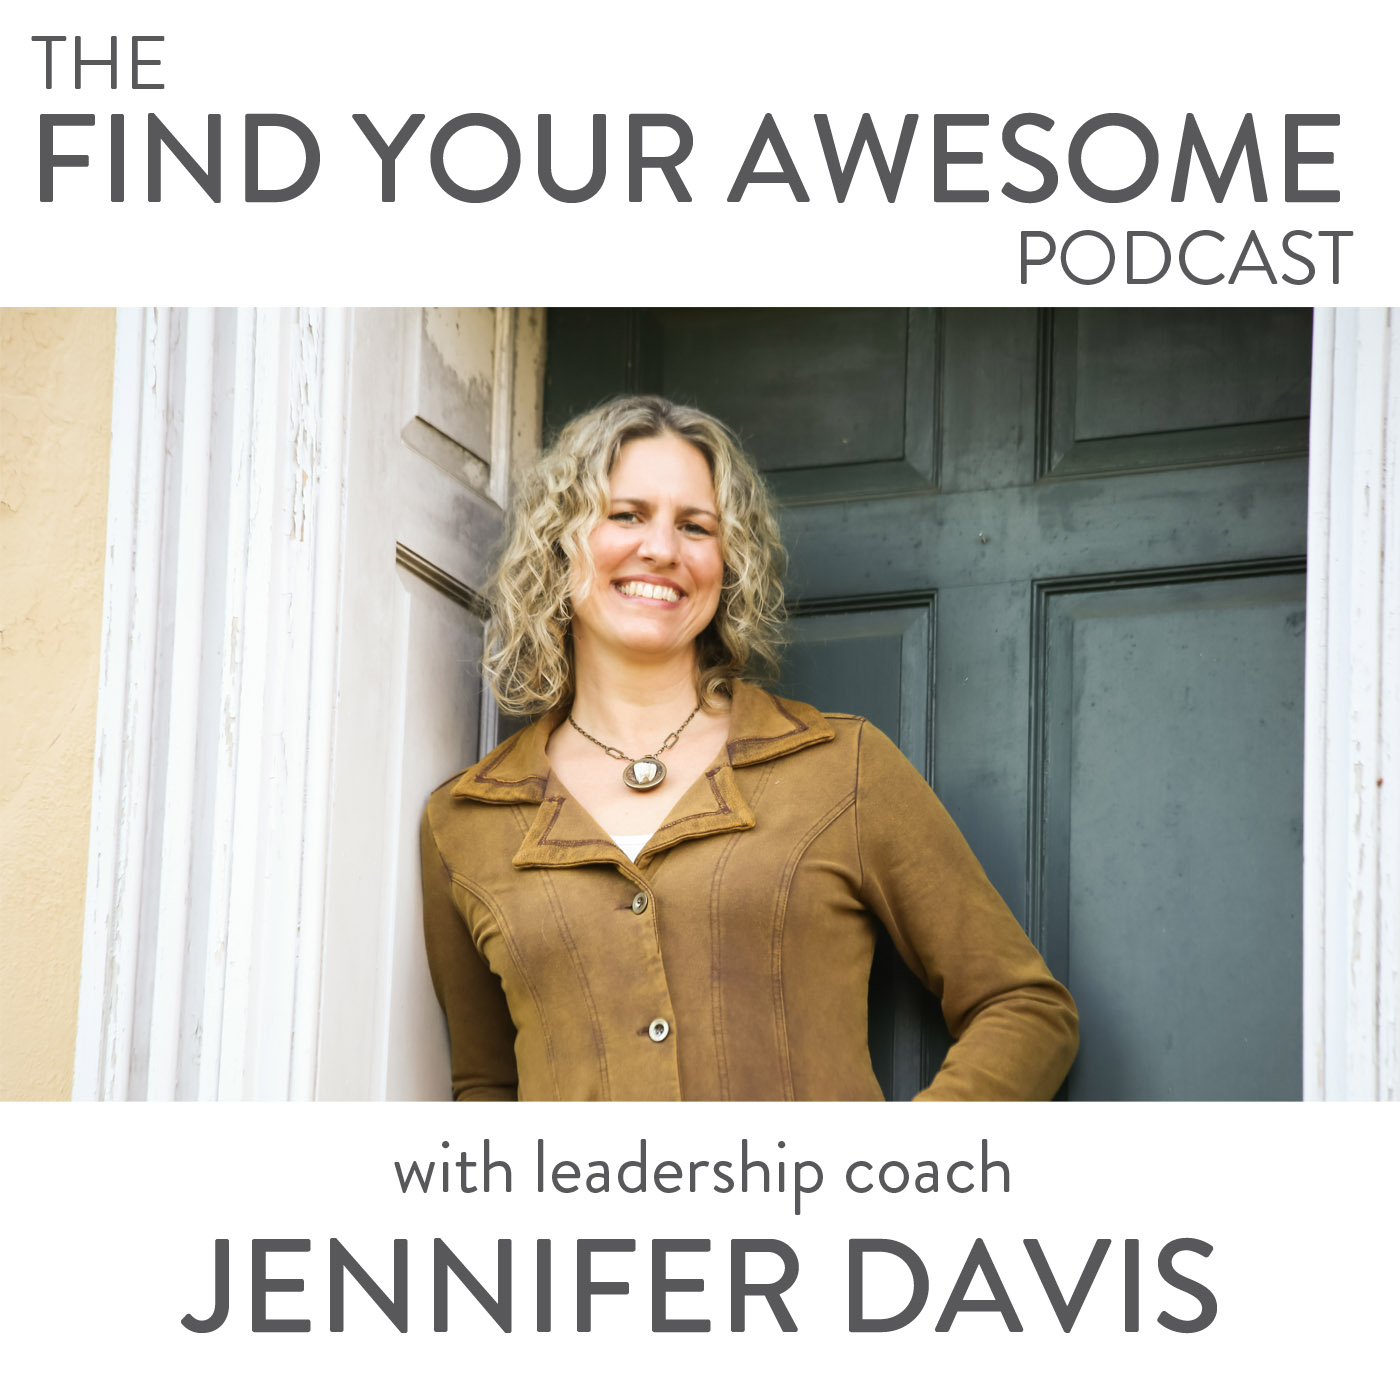 JenniferDavis_podcast_coverart.jpg